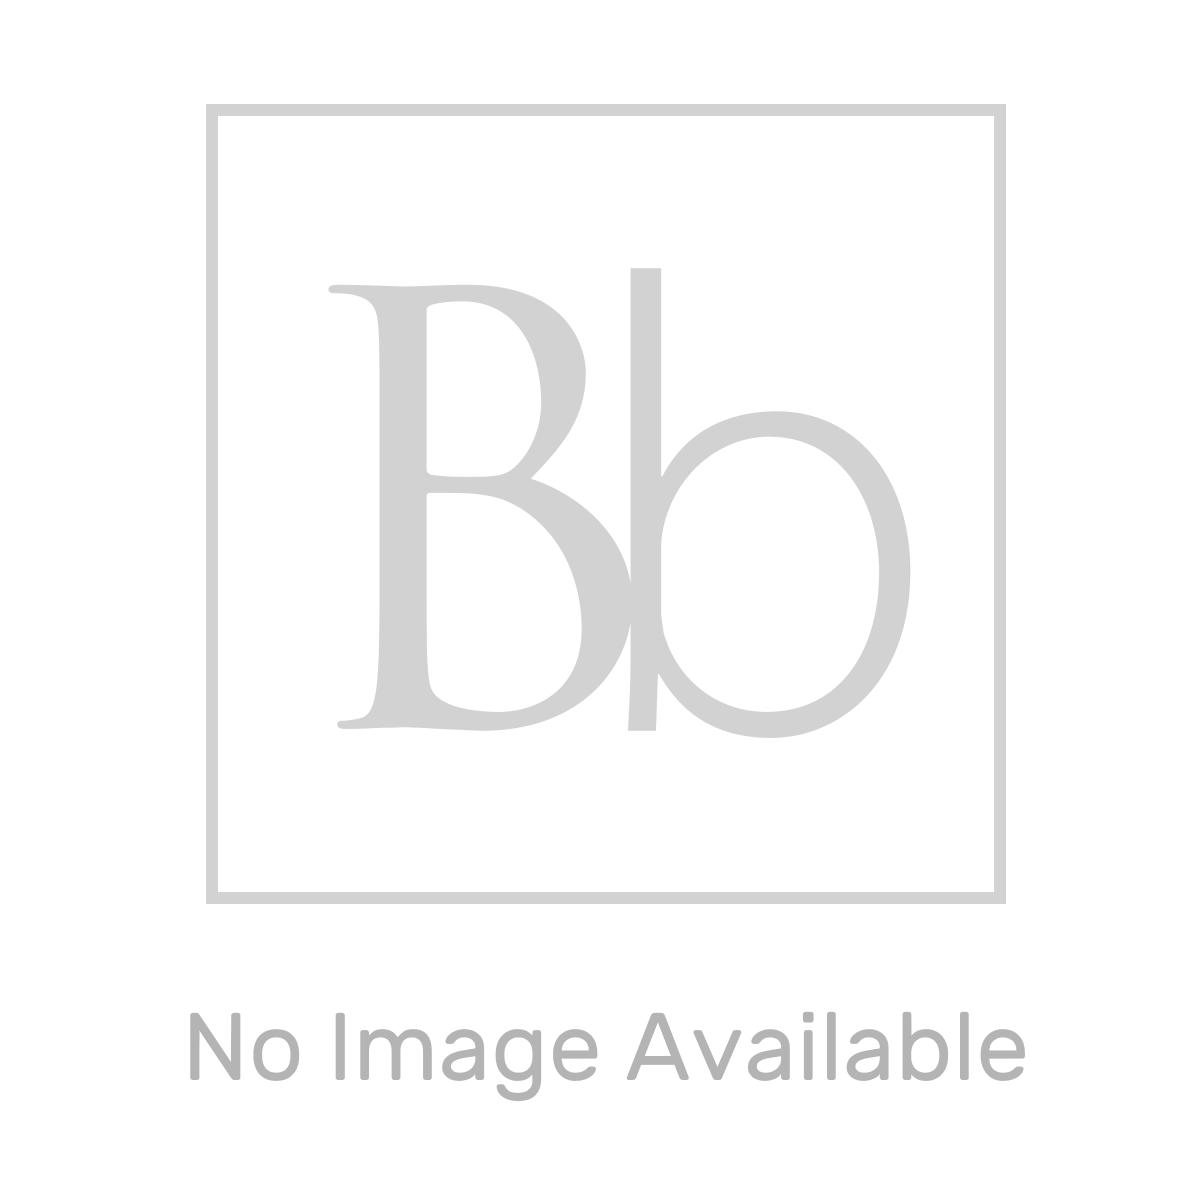 McAlpine CONFLEX-KIT1 Flexible Condensate Pipe Kit